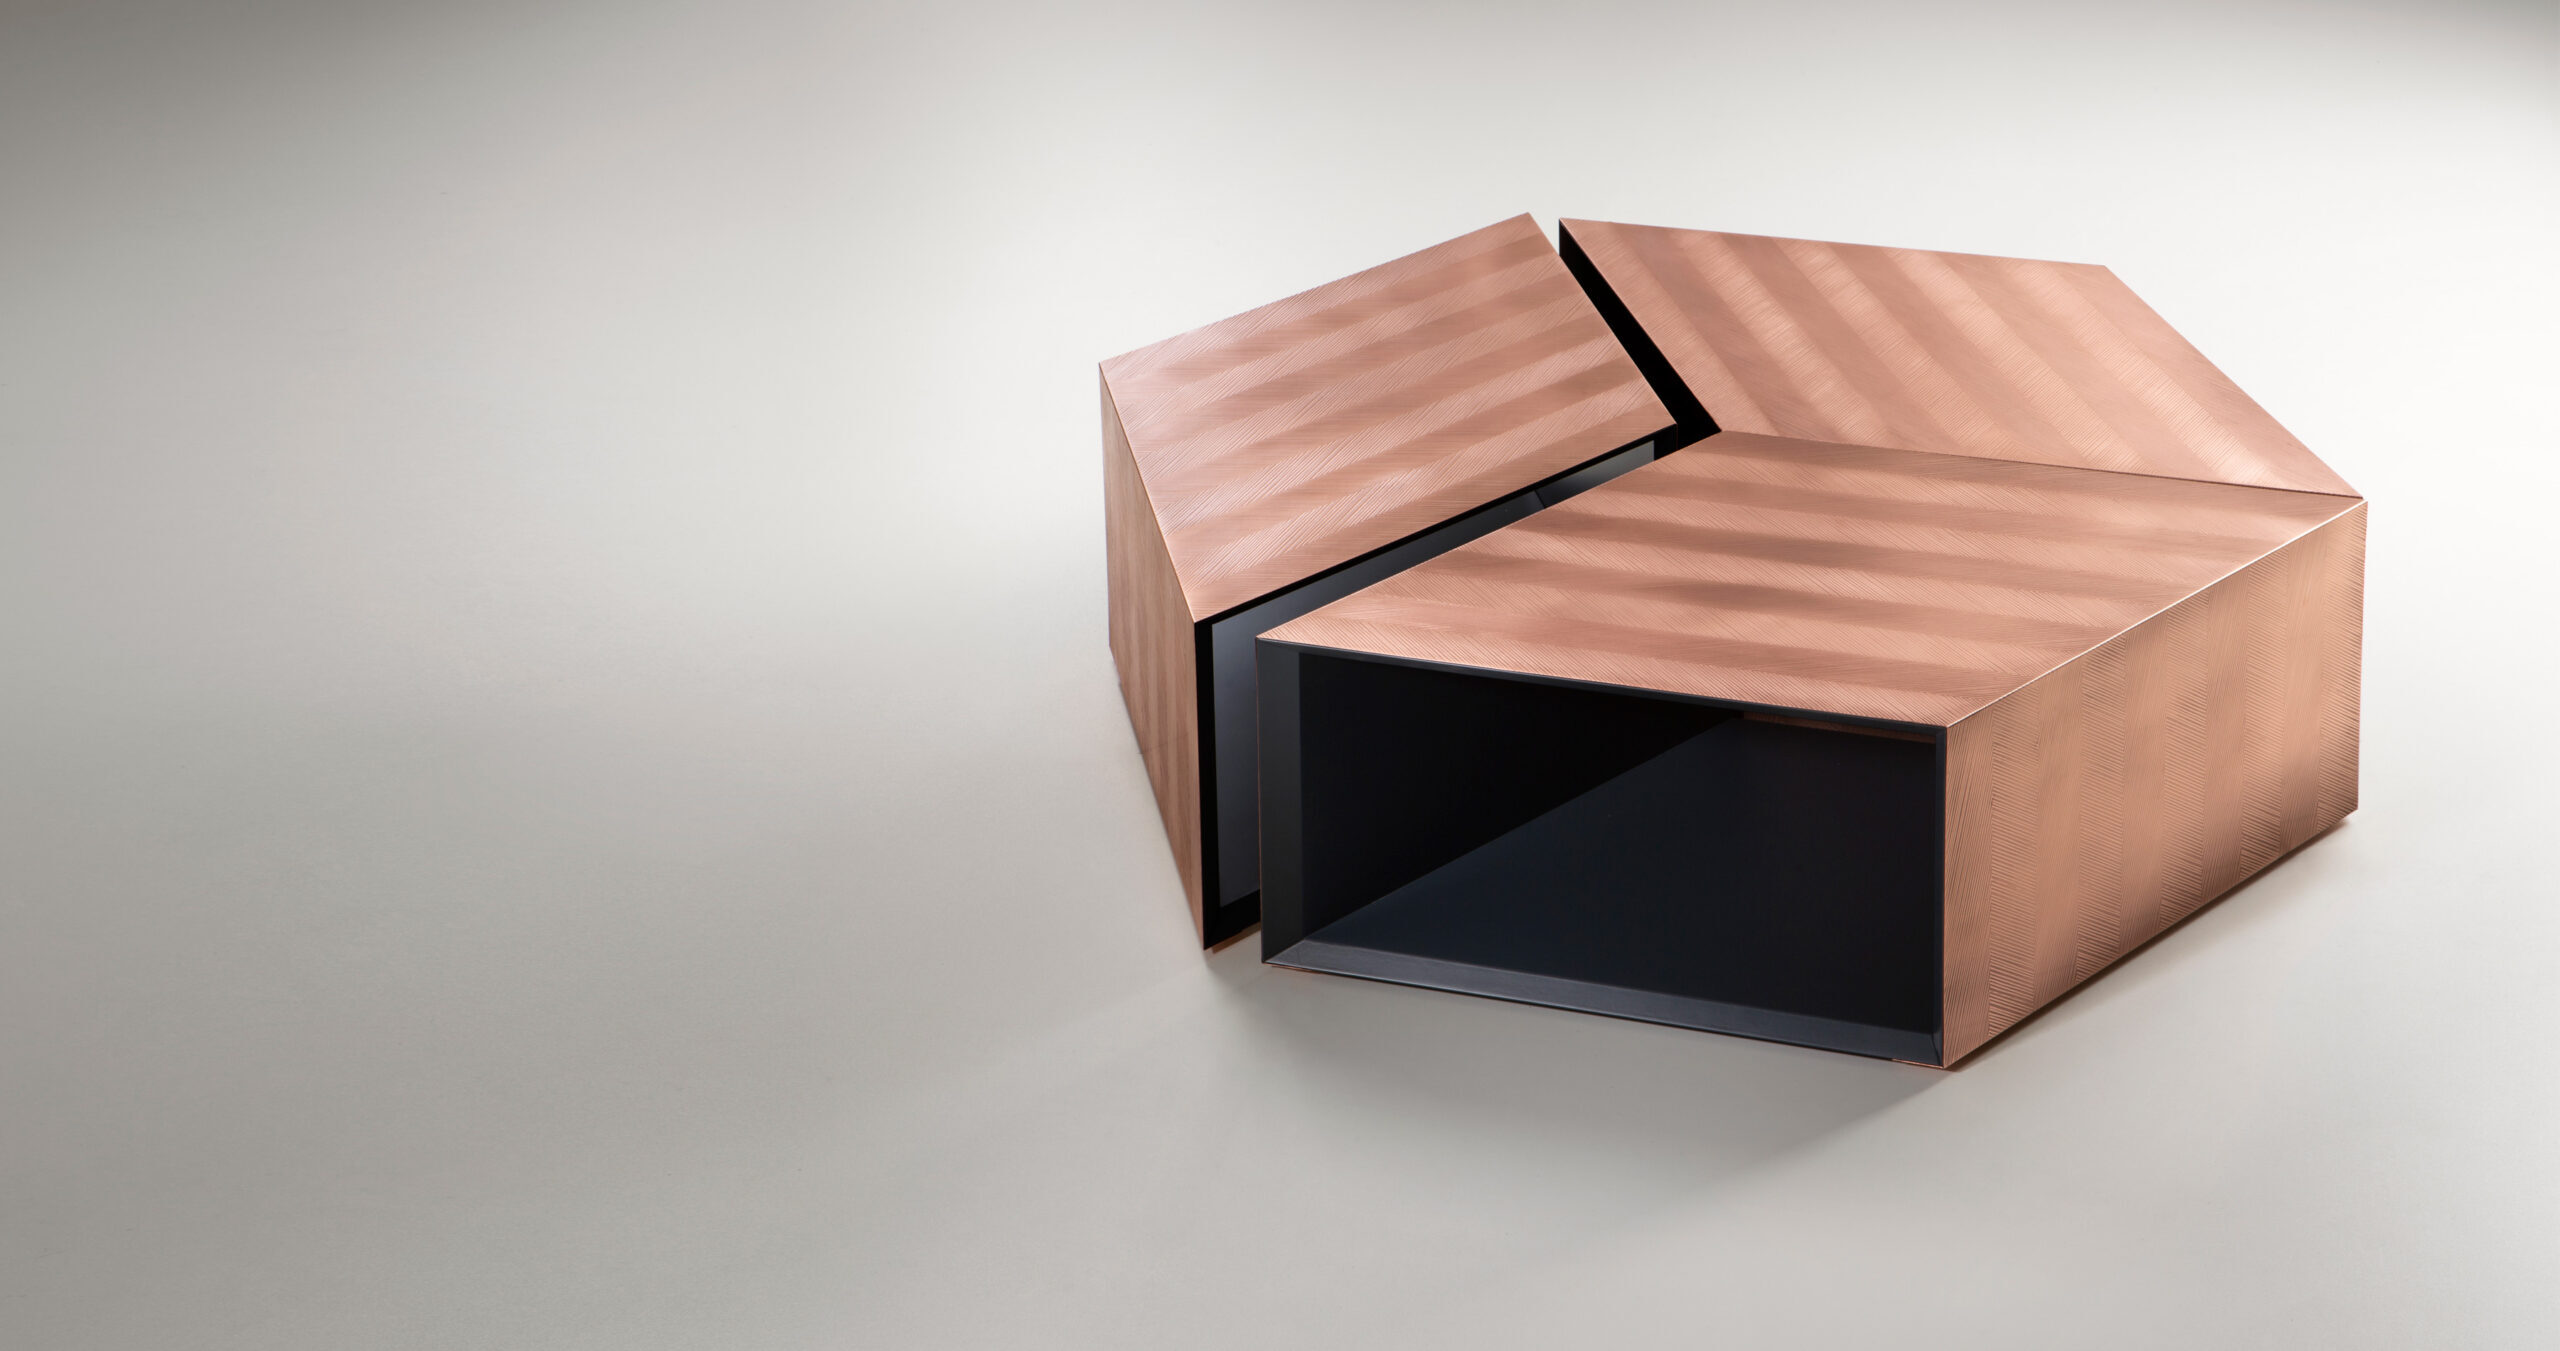 De Castelli-Alpha-Design Martinelli Venezia-PH Alberto Parise